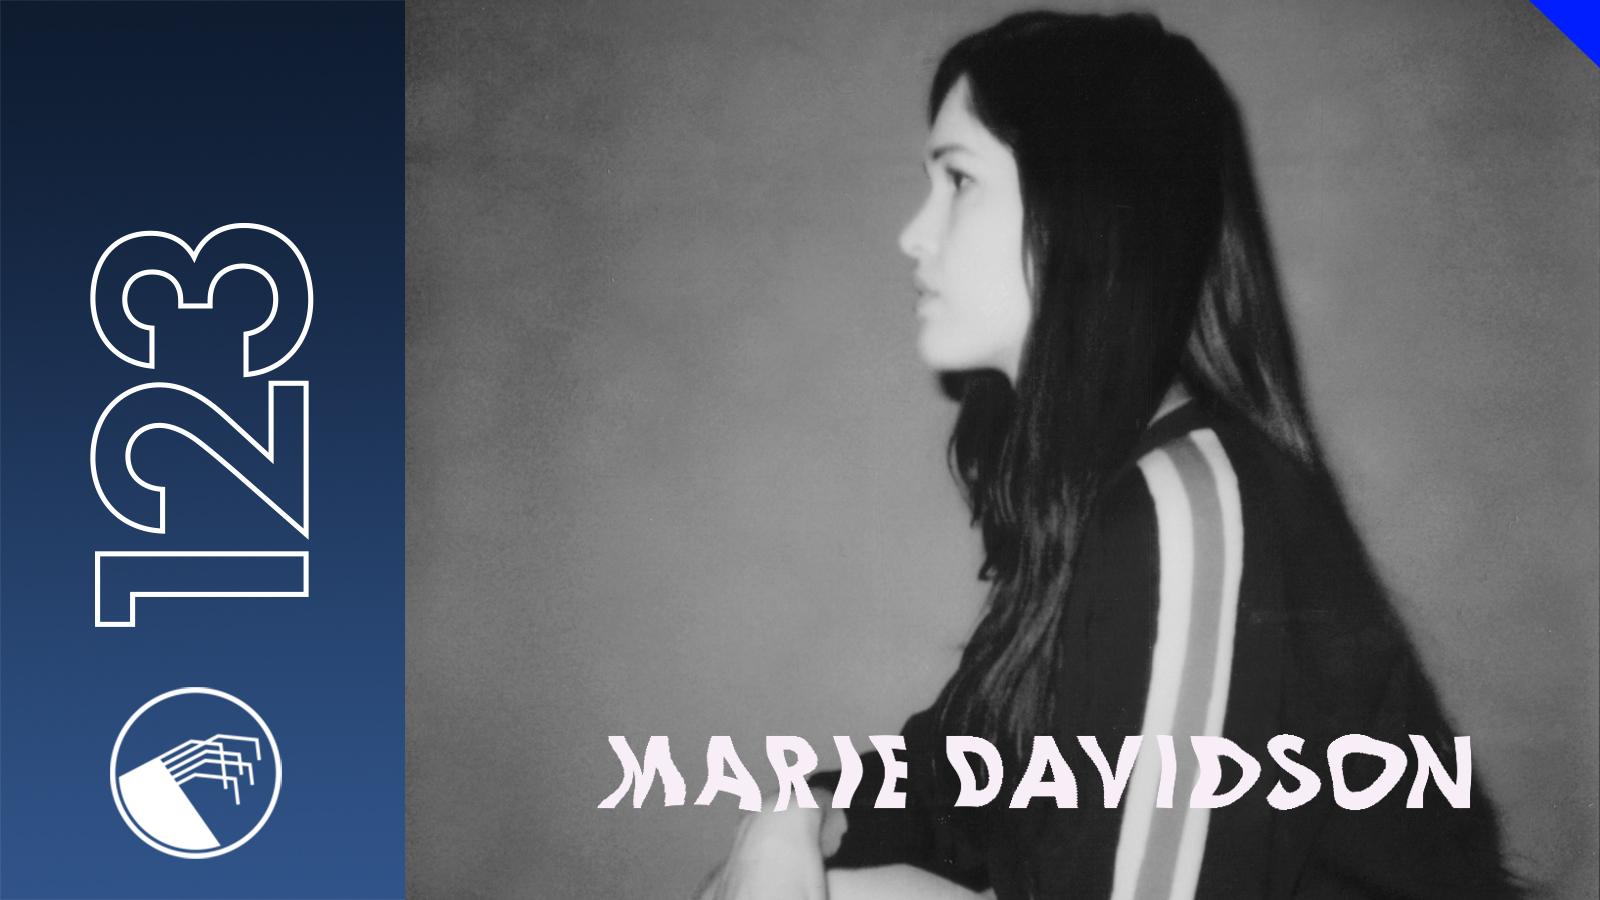 123 Marie Davidson